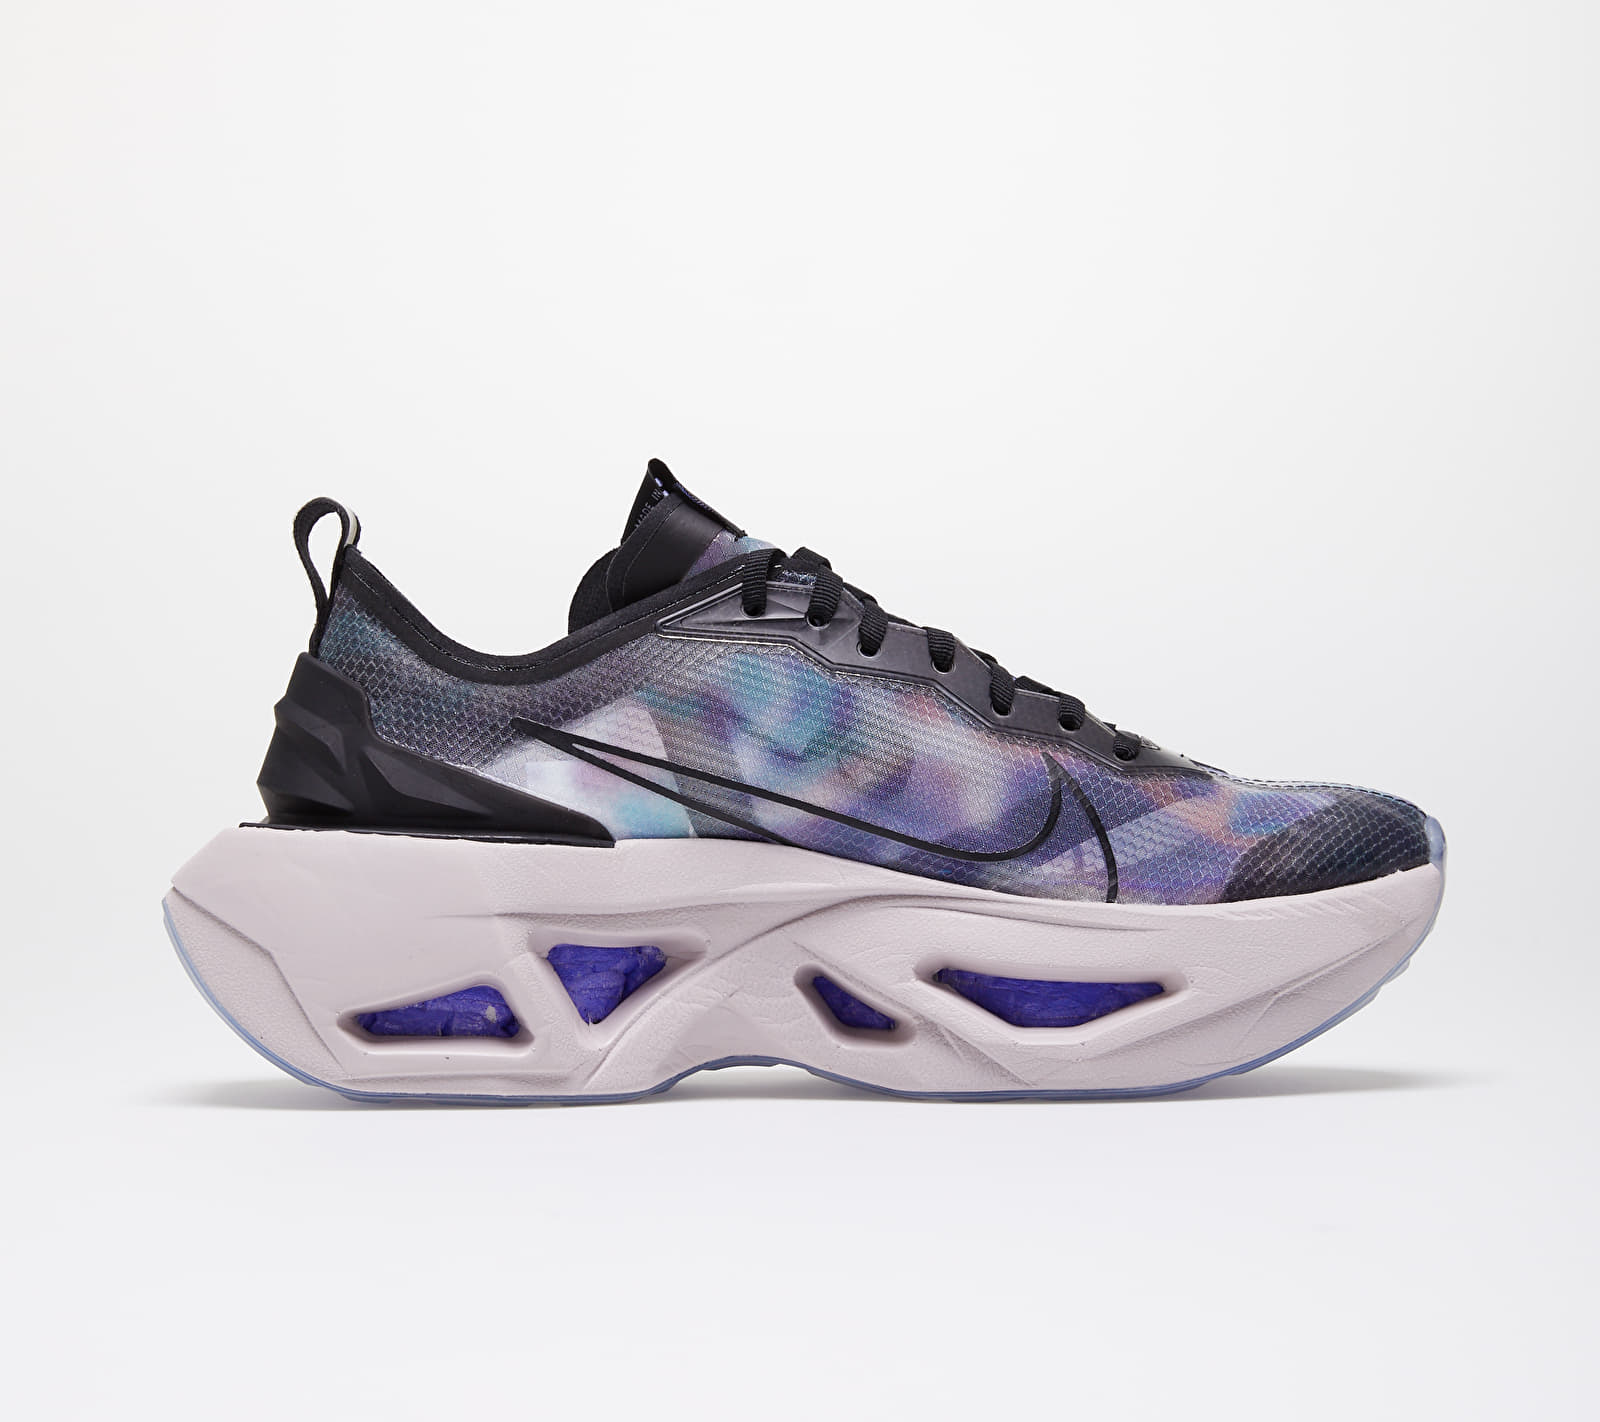 Nike W ZoomX Vista Grind SP Platinum Violet/ Black-Oracle Aqua, Purple